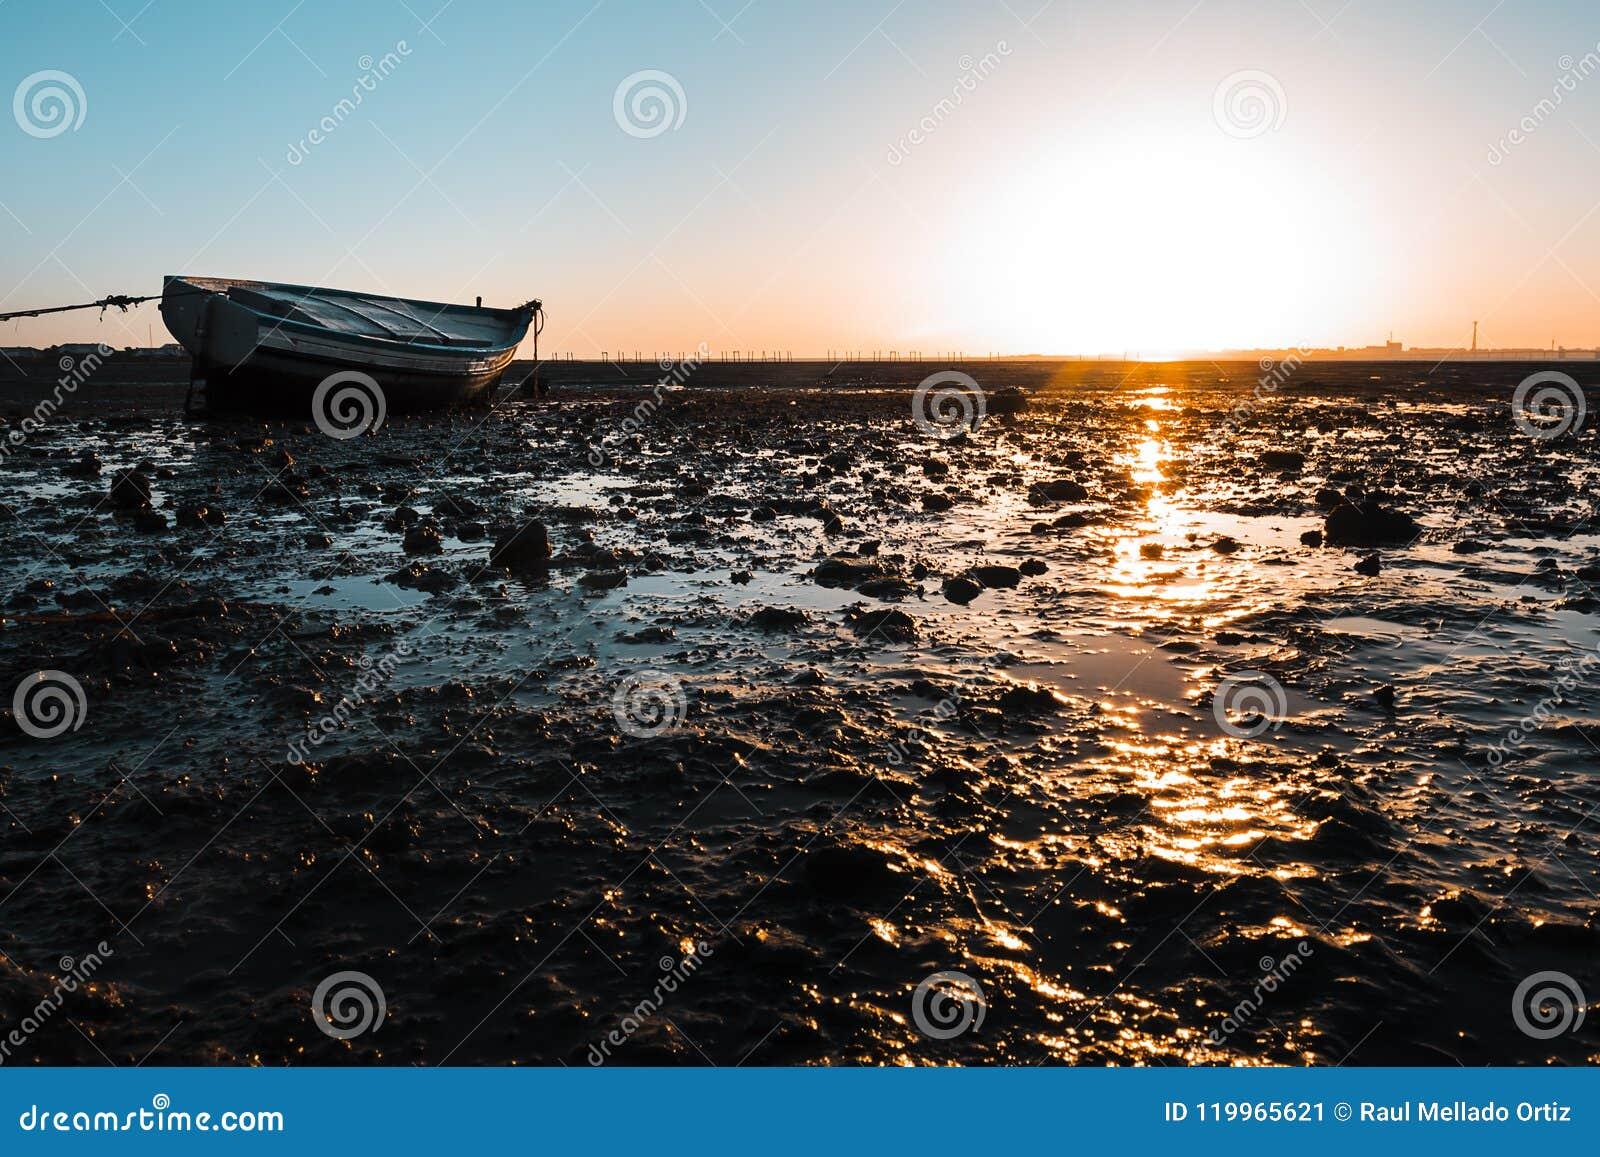 Sunset At Anchor Fishing Boat At Low Tide Stock Photo